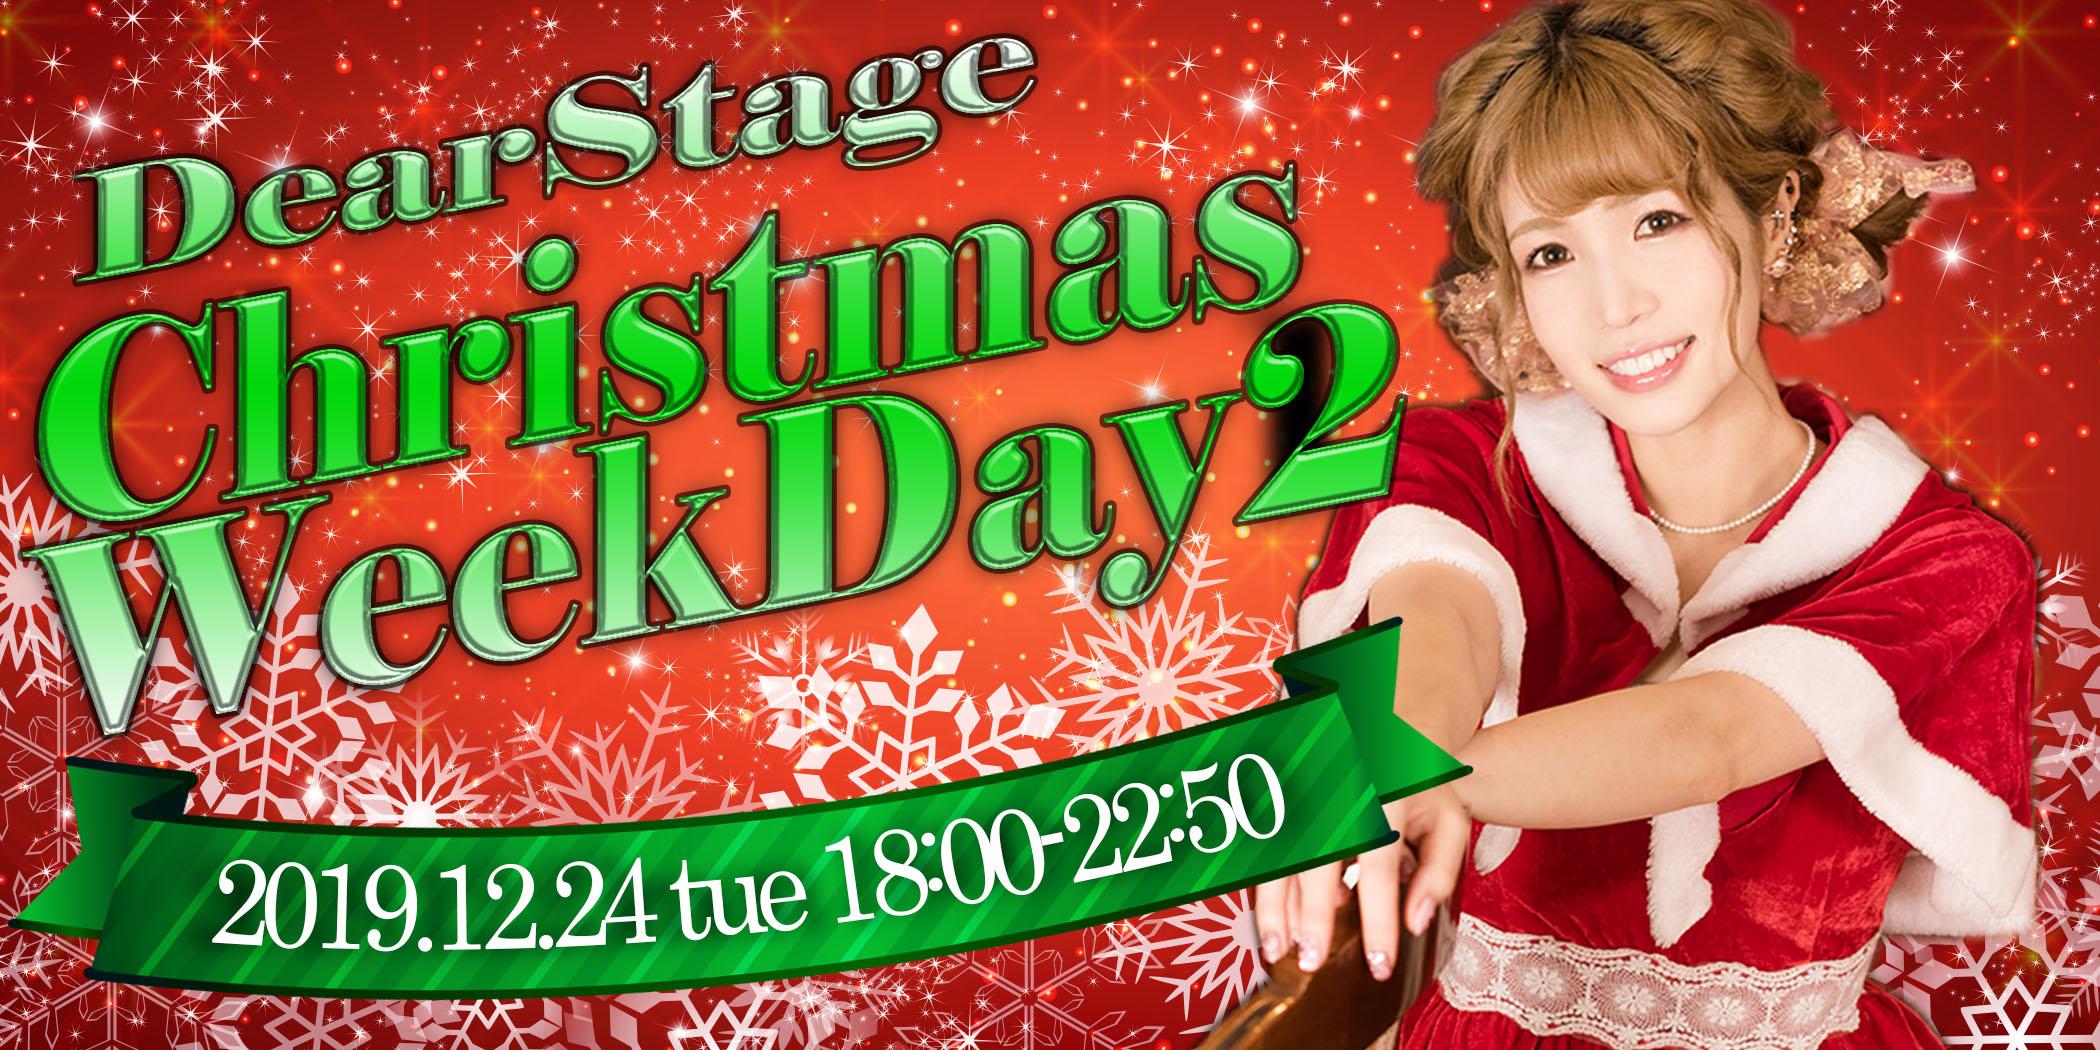 DearStage Christmas Week Day2